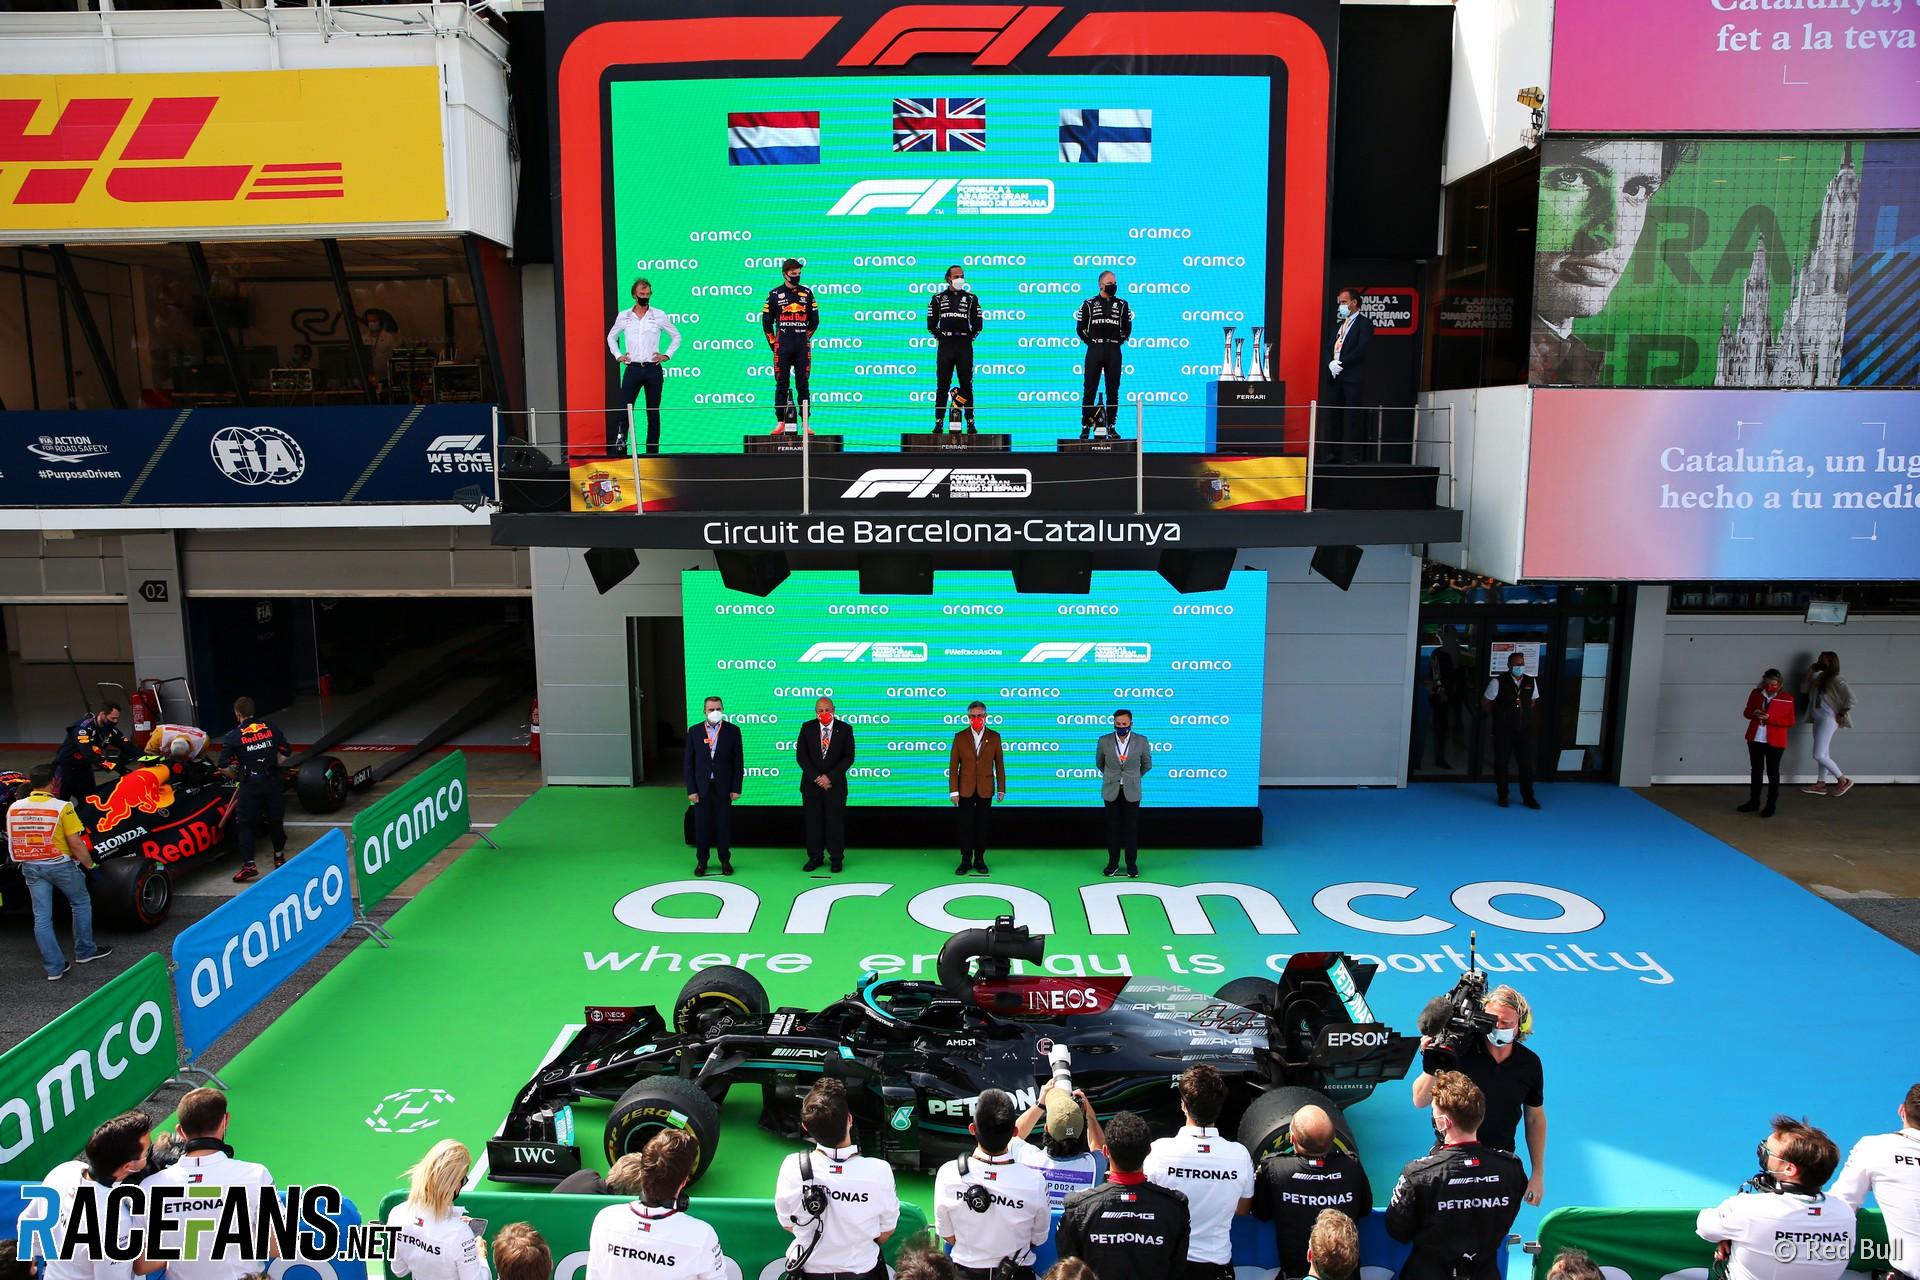 Podium, Circuit de Catalunya, 2021